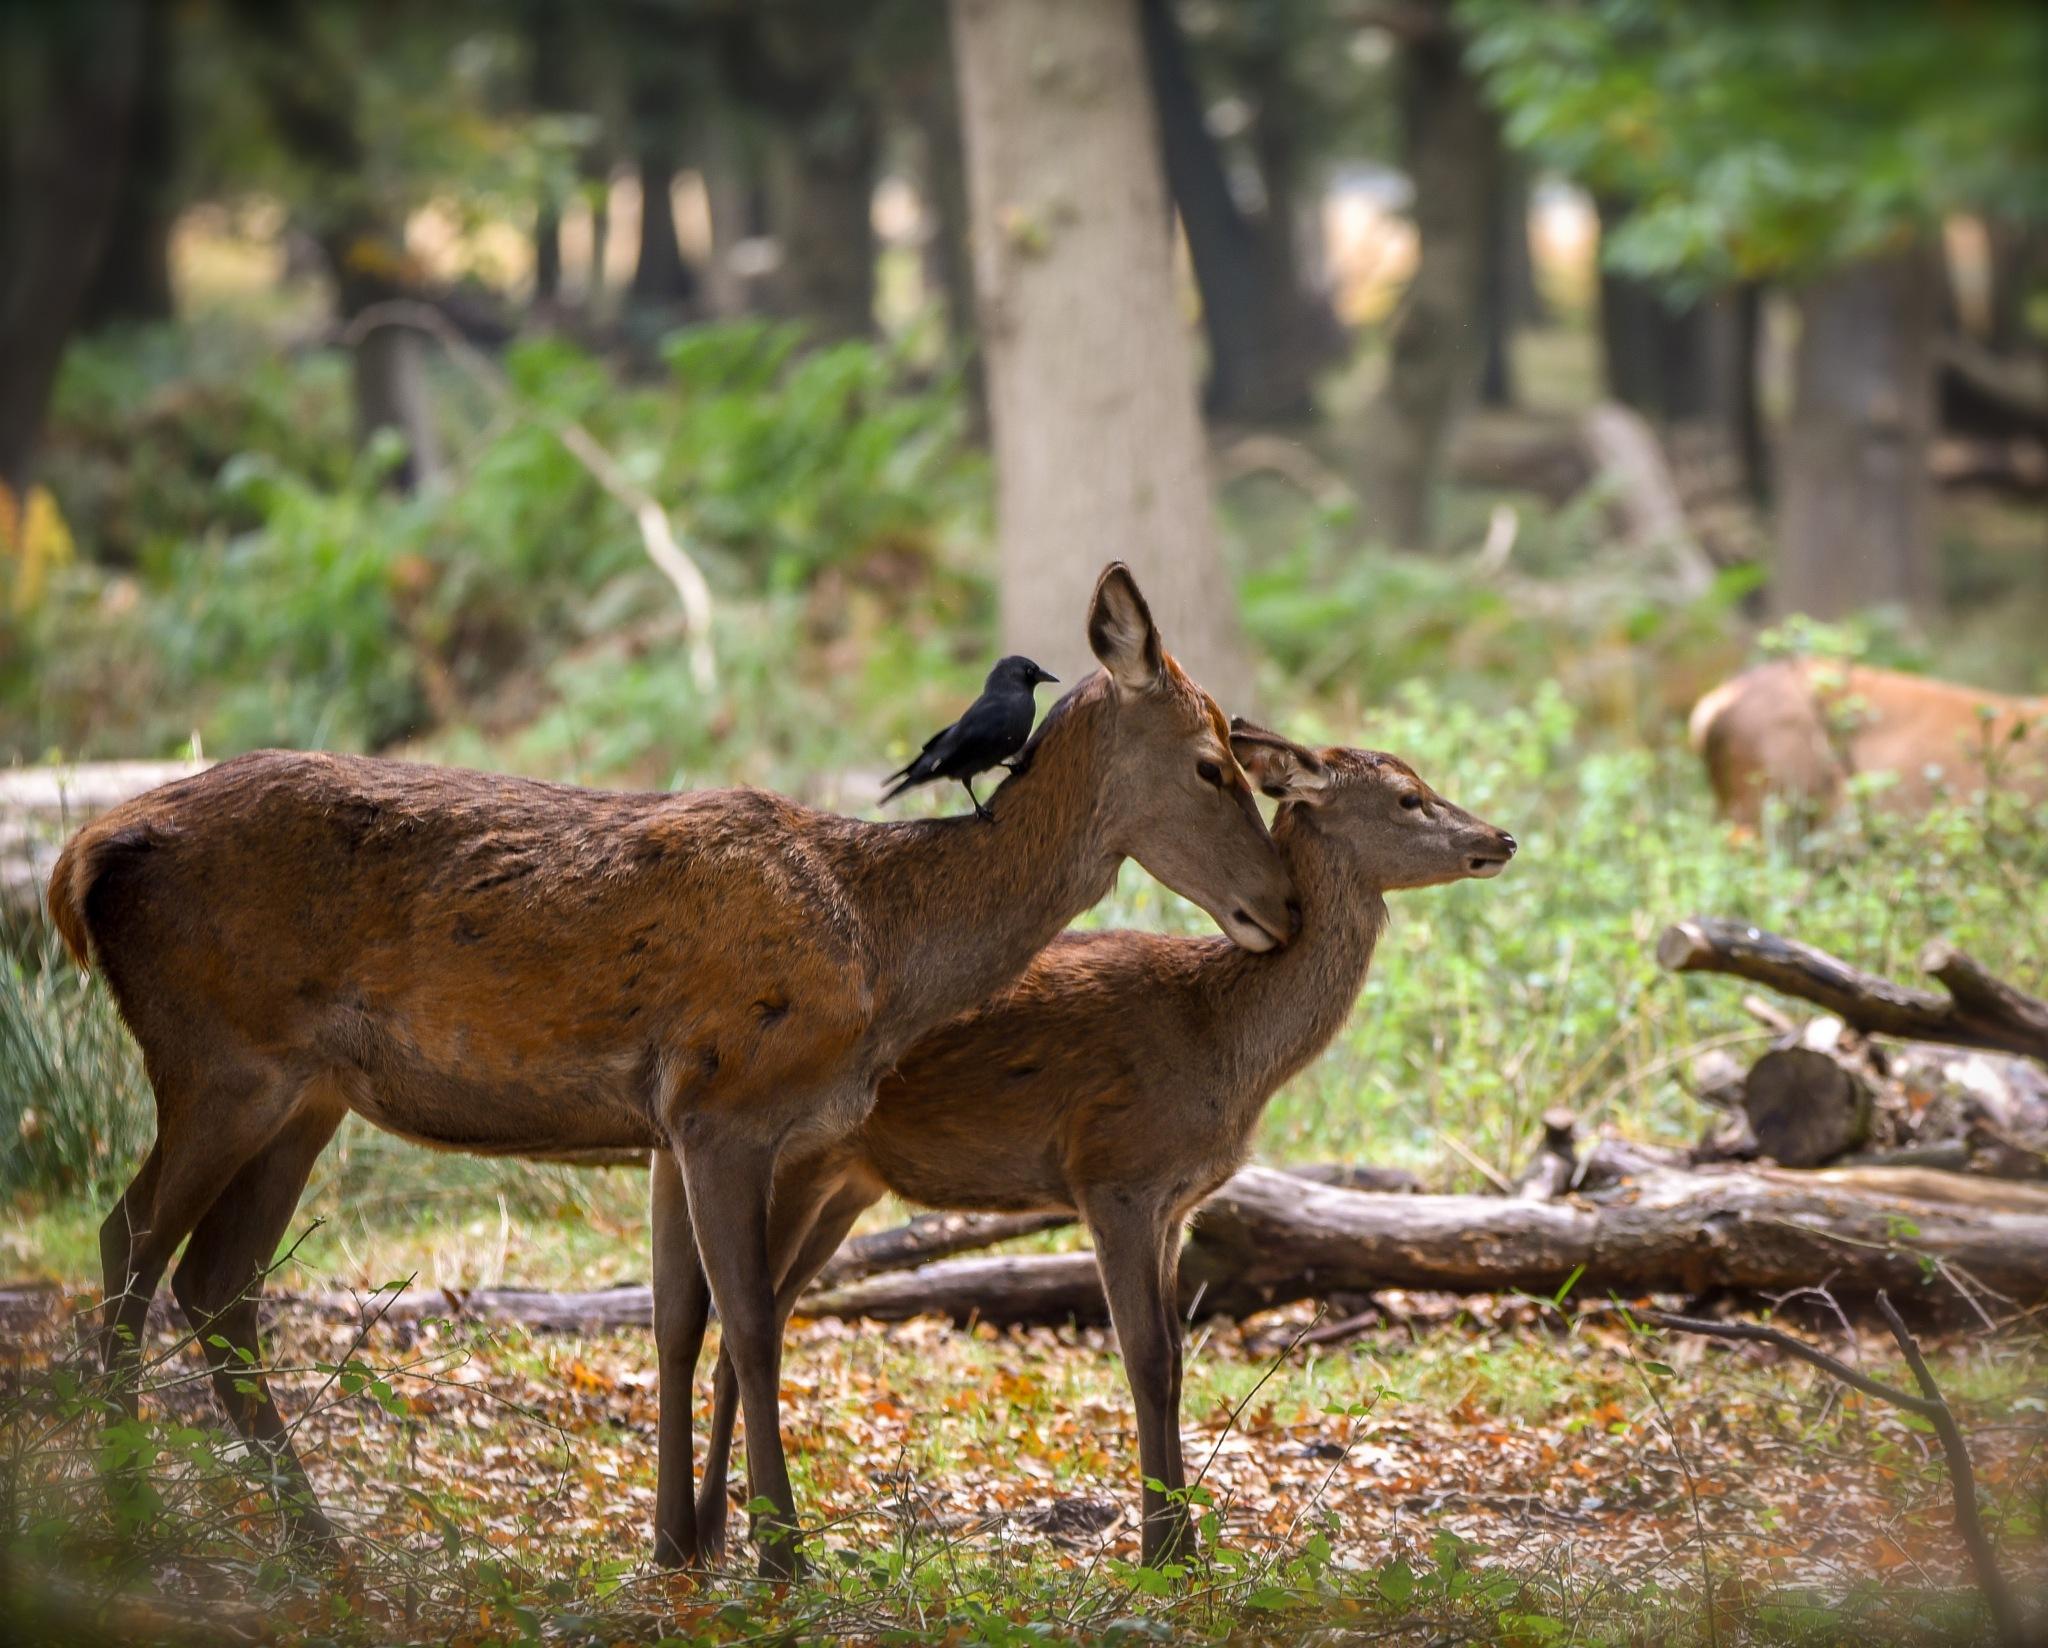 Two's company, three's a crowd! by Nikkiad